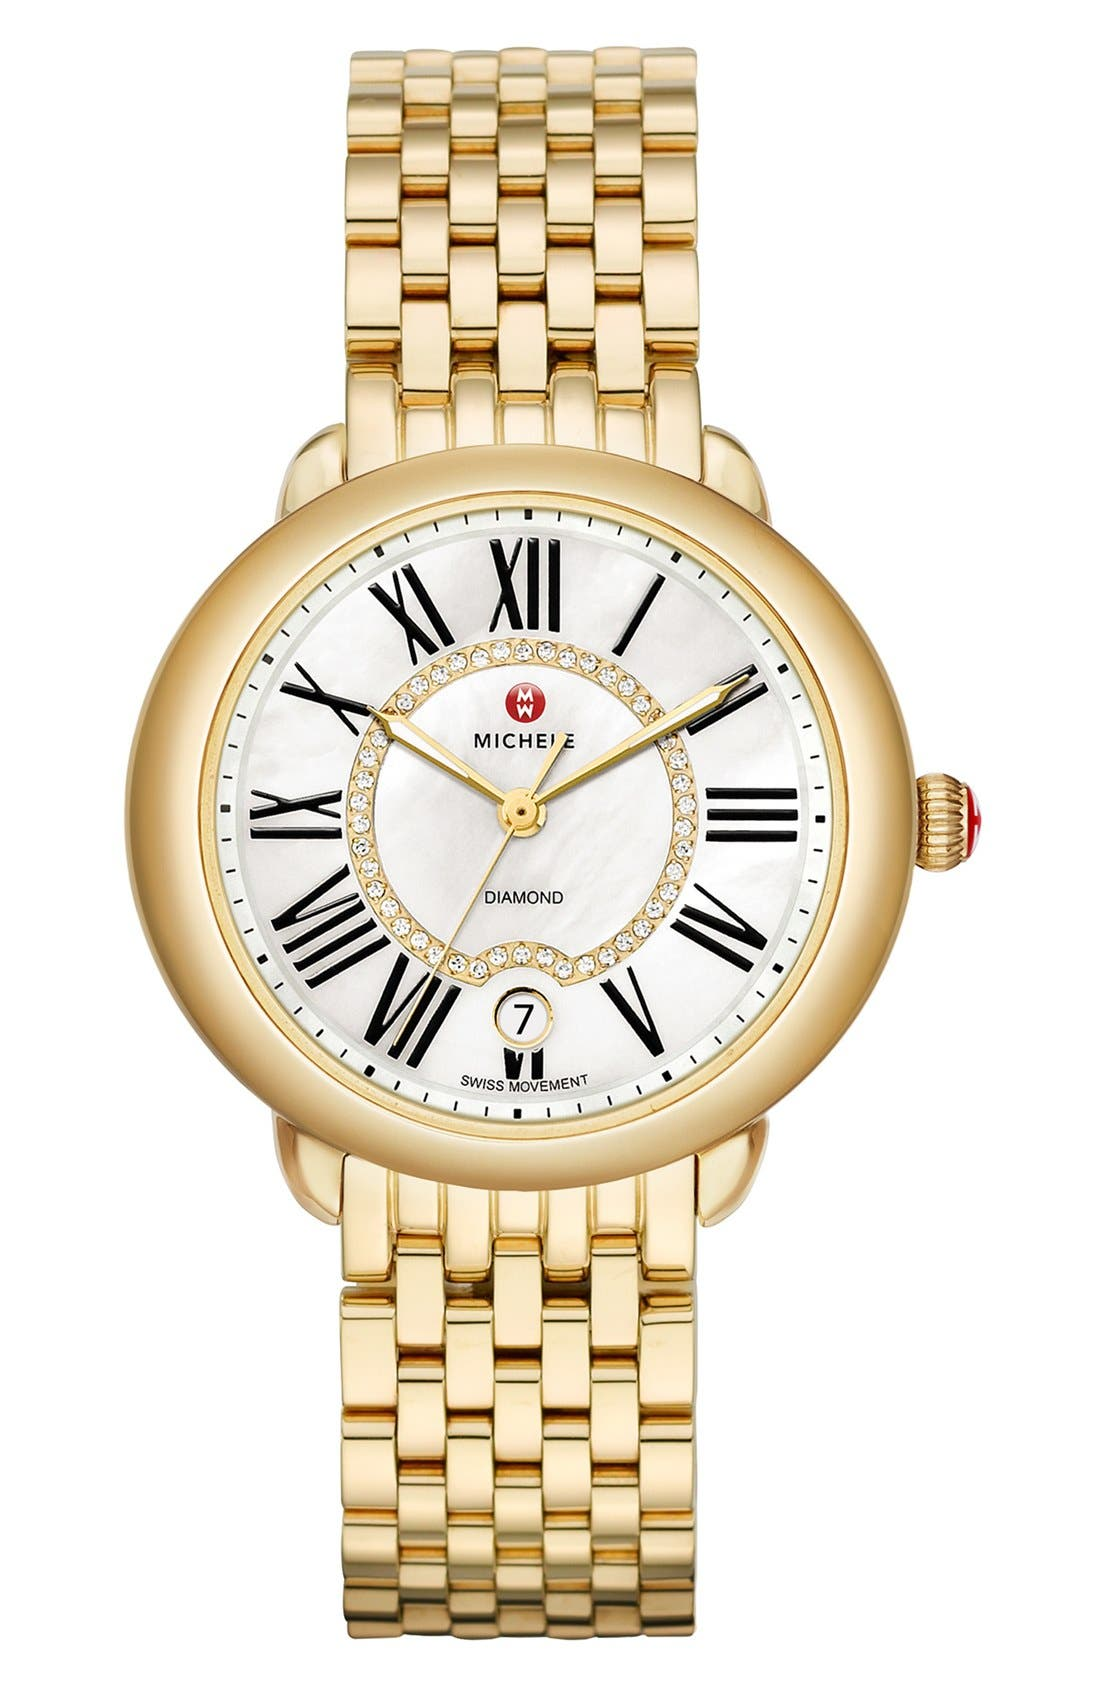 Serein 16 Diamond Dial Watch Head, 34mm x 36mm,                             Alternate thumbnail 4, color,                             GOLD